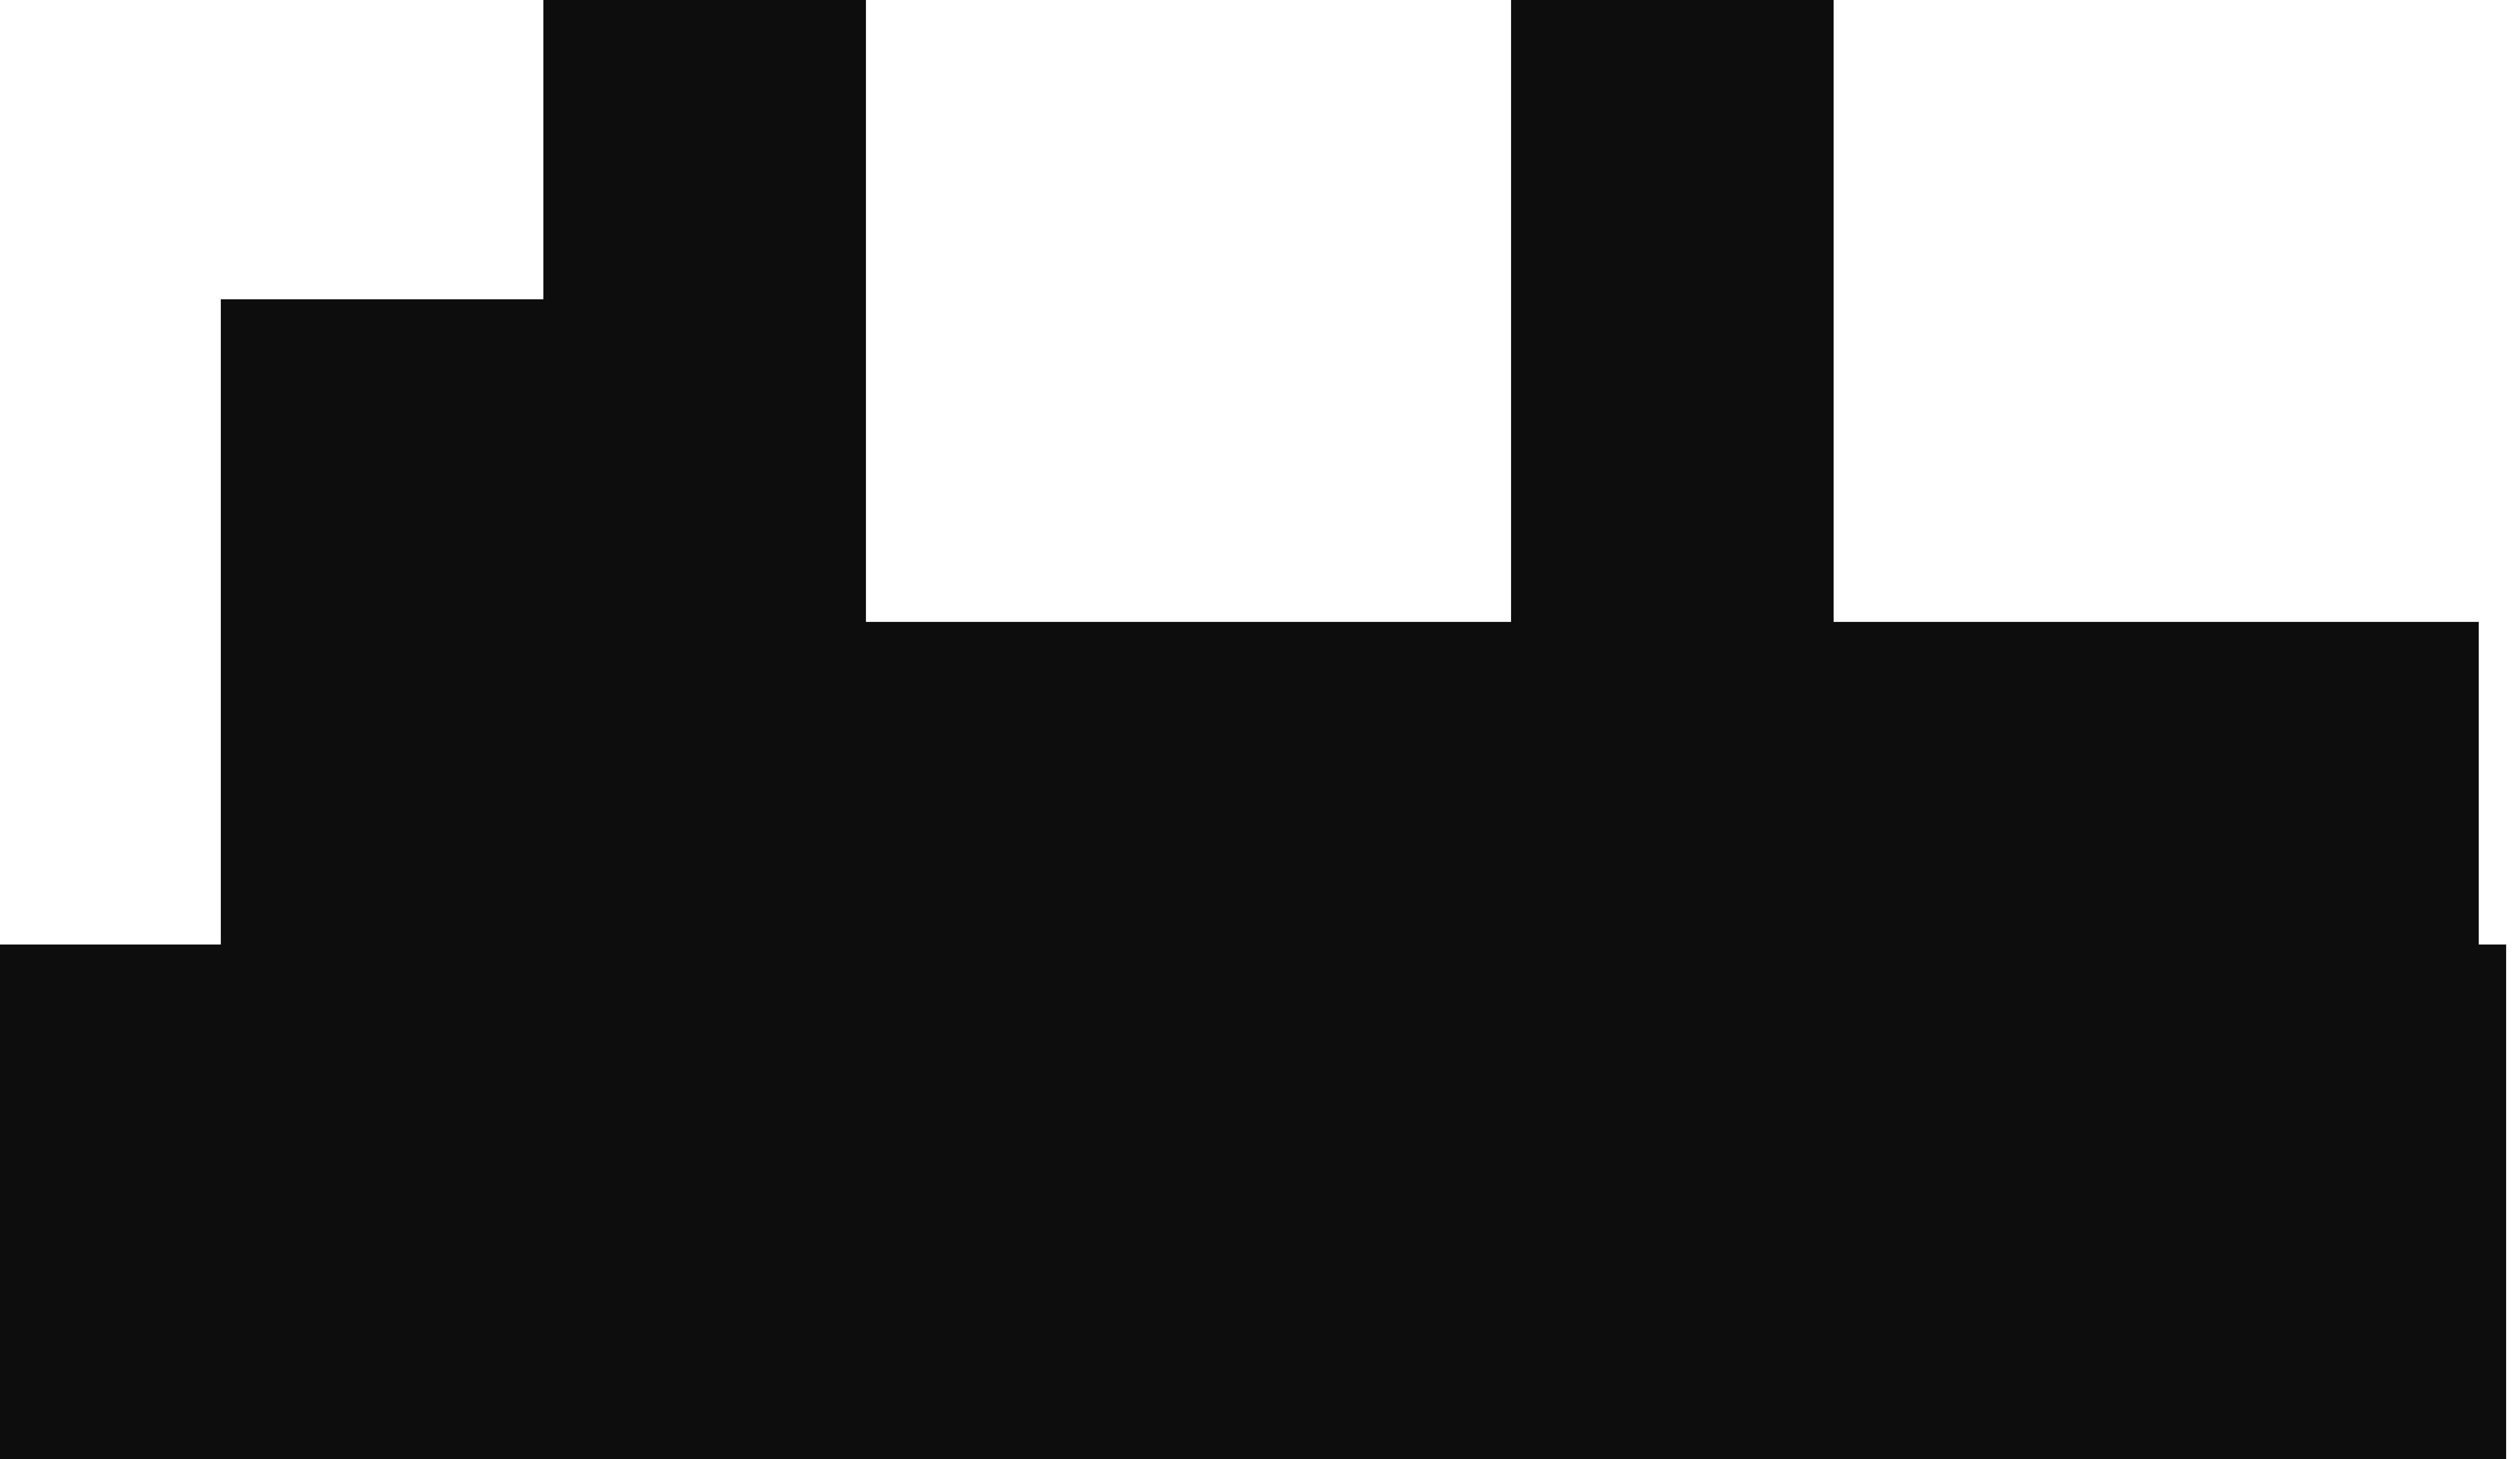 8000x4631 New York City Skyline Silhouette Png Clip Artu200b Gallery